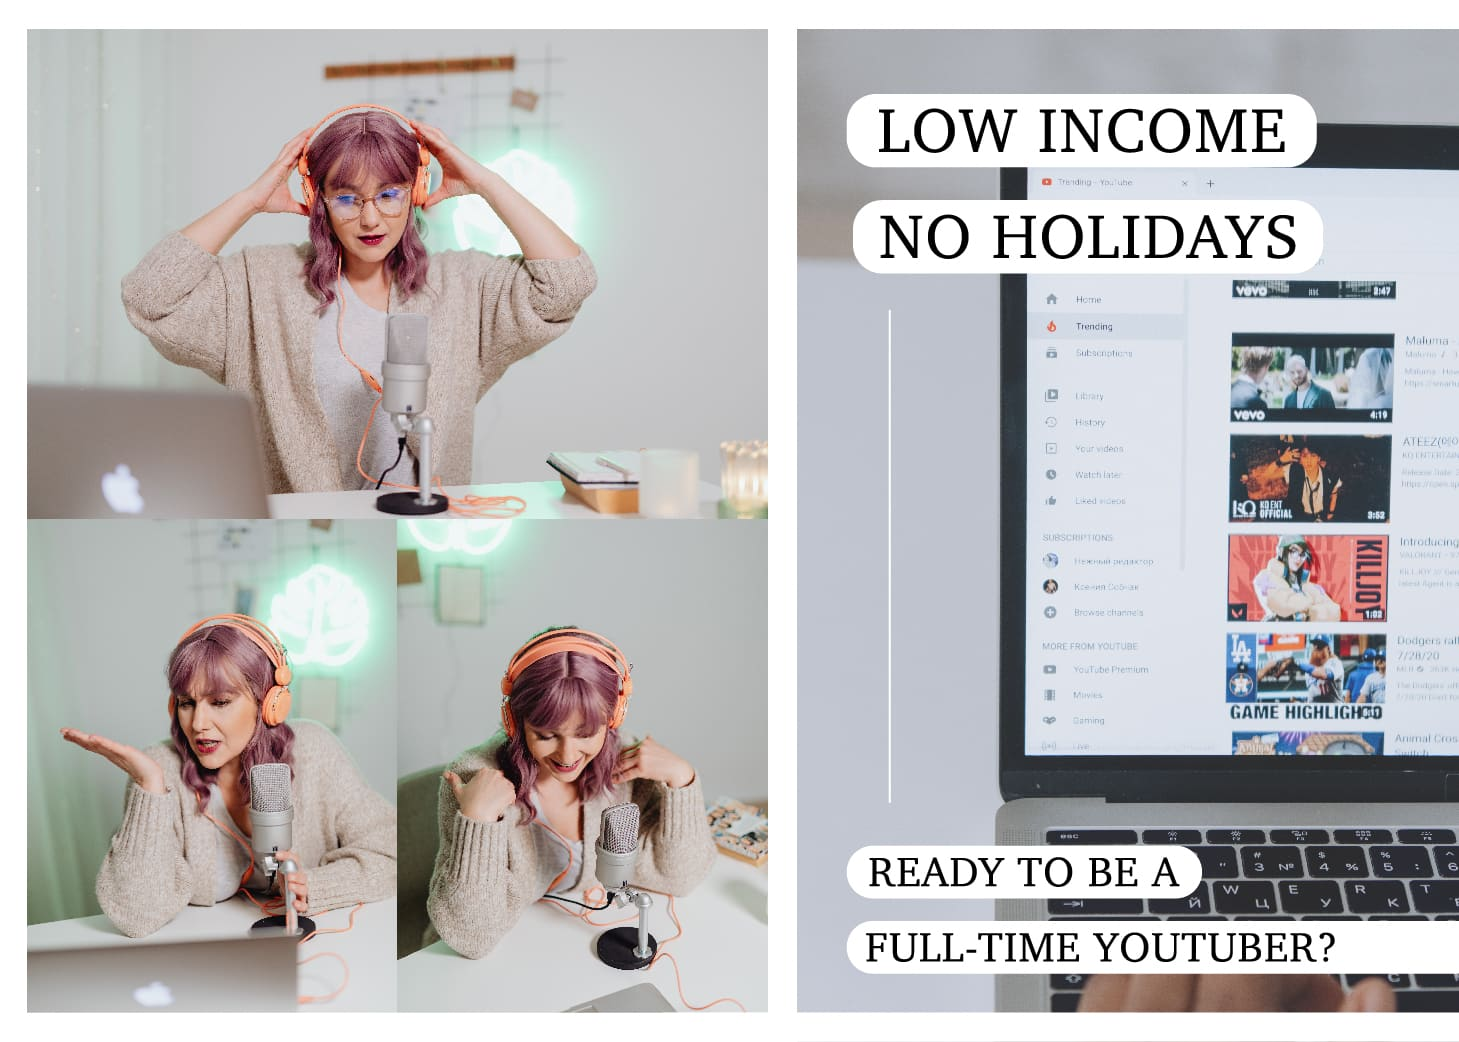 Low Income, No Holidays, Ready To Be A Full-Time Youtuber?自媒體甘苦談|改行做「全職 Youtuber」前,先問自己下面4個問題⋯⋯你的準備夠充分嗎?